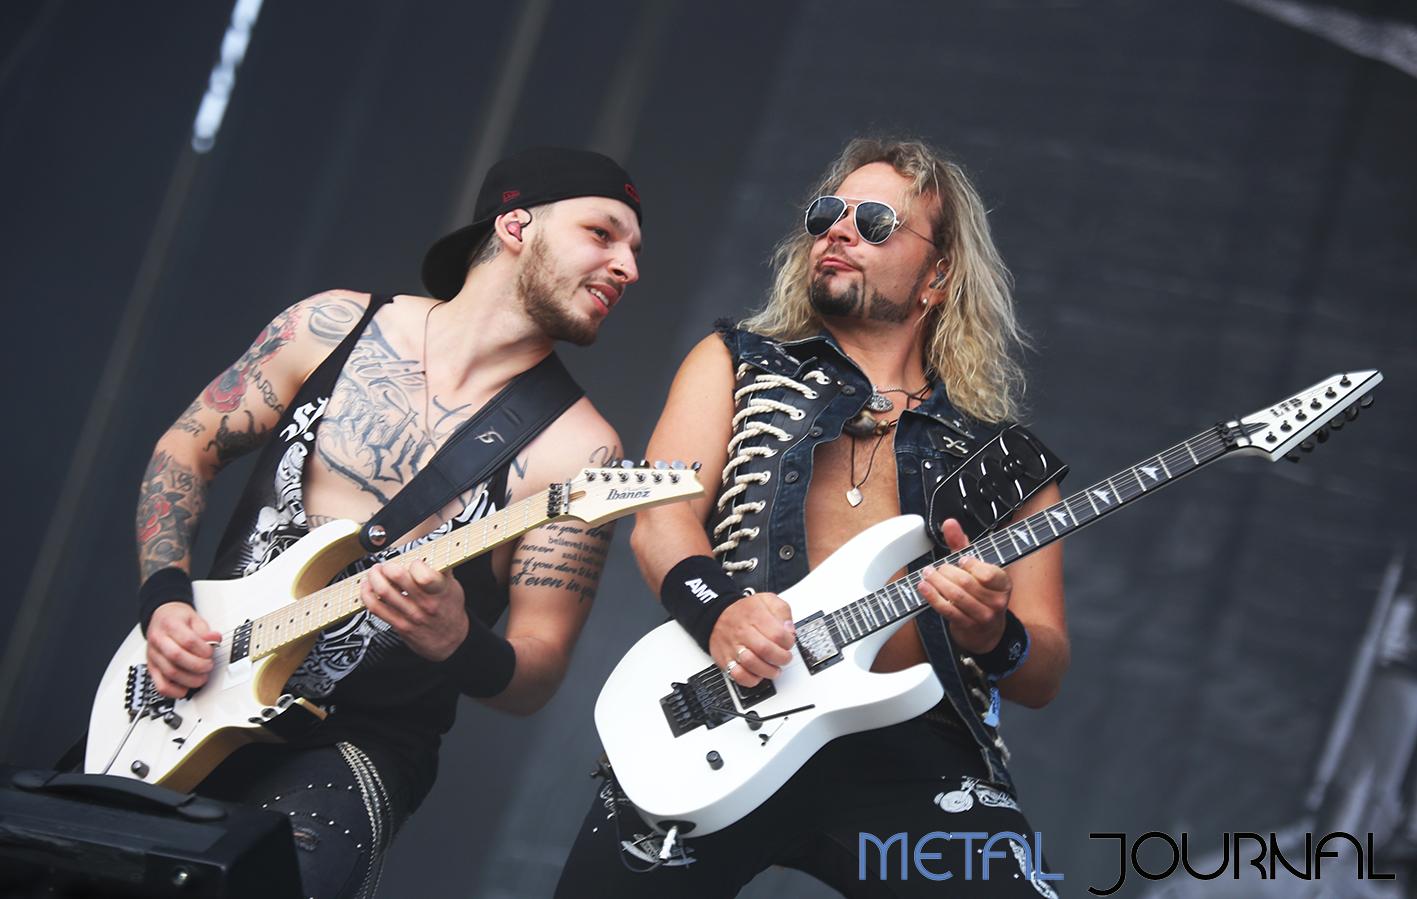 udo - metal journal rock fest barcelona 2019 pic 9